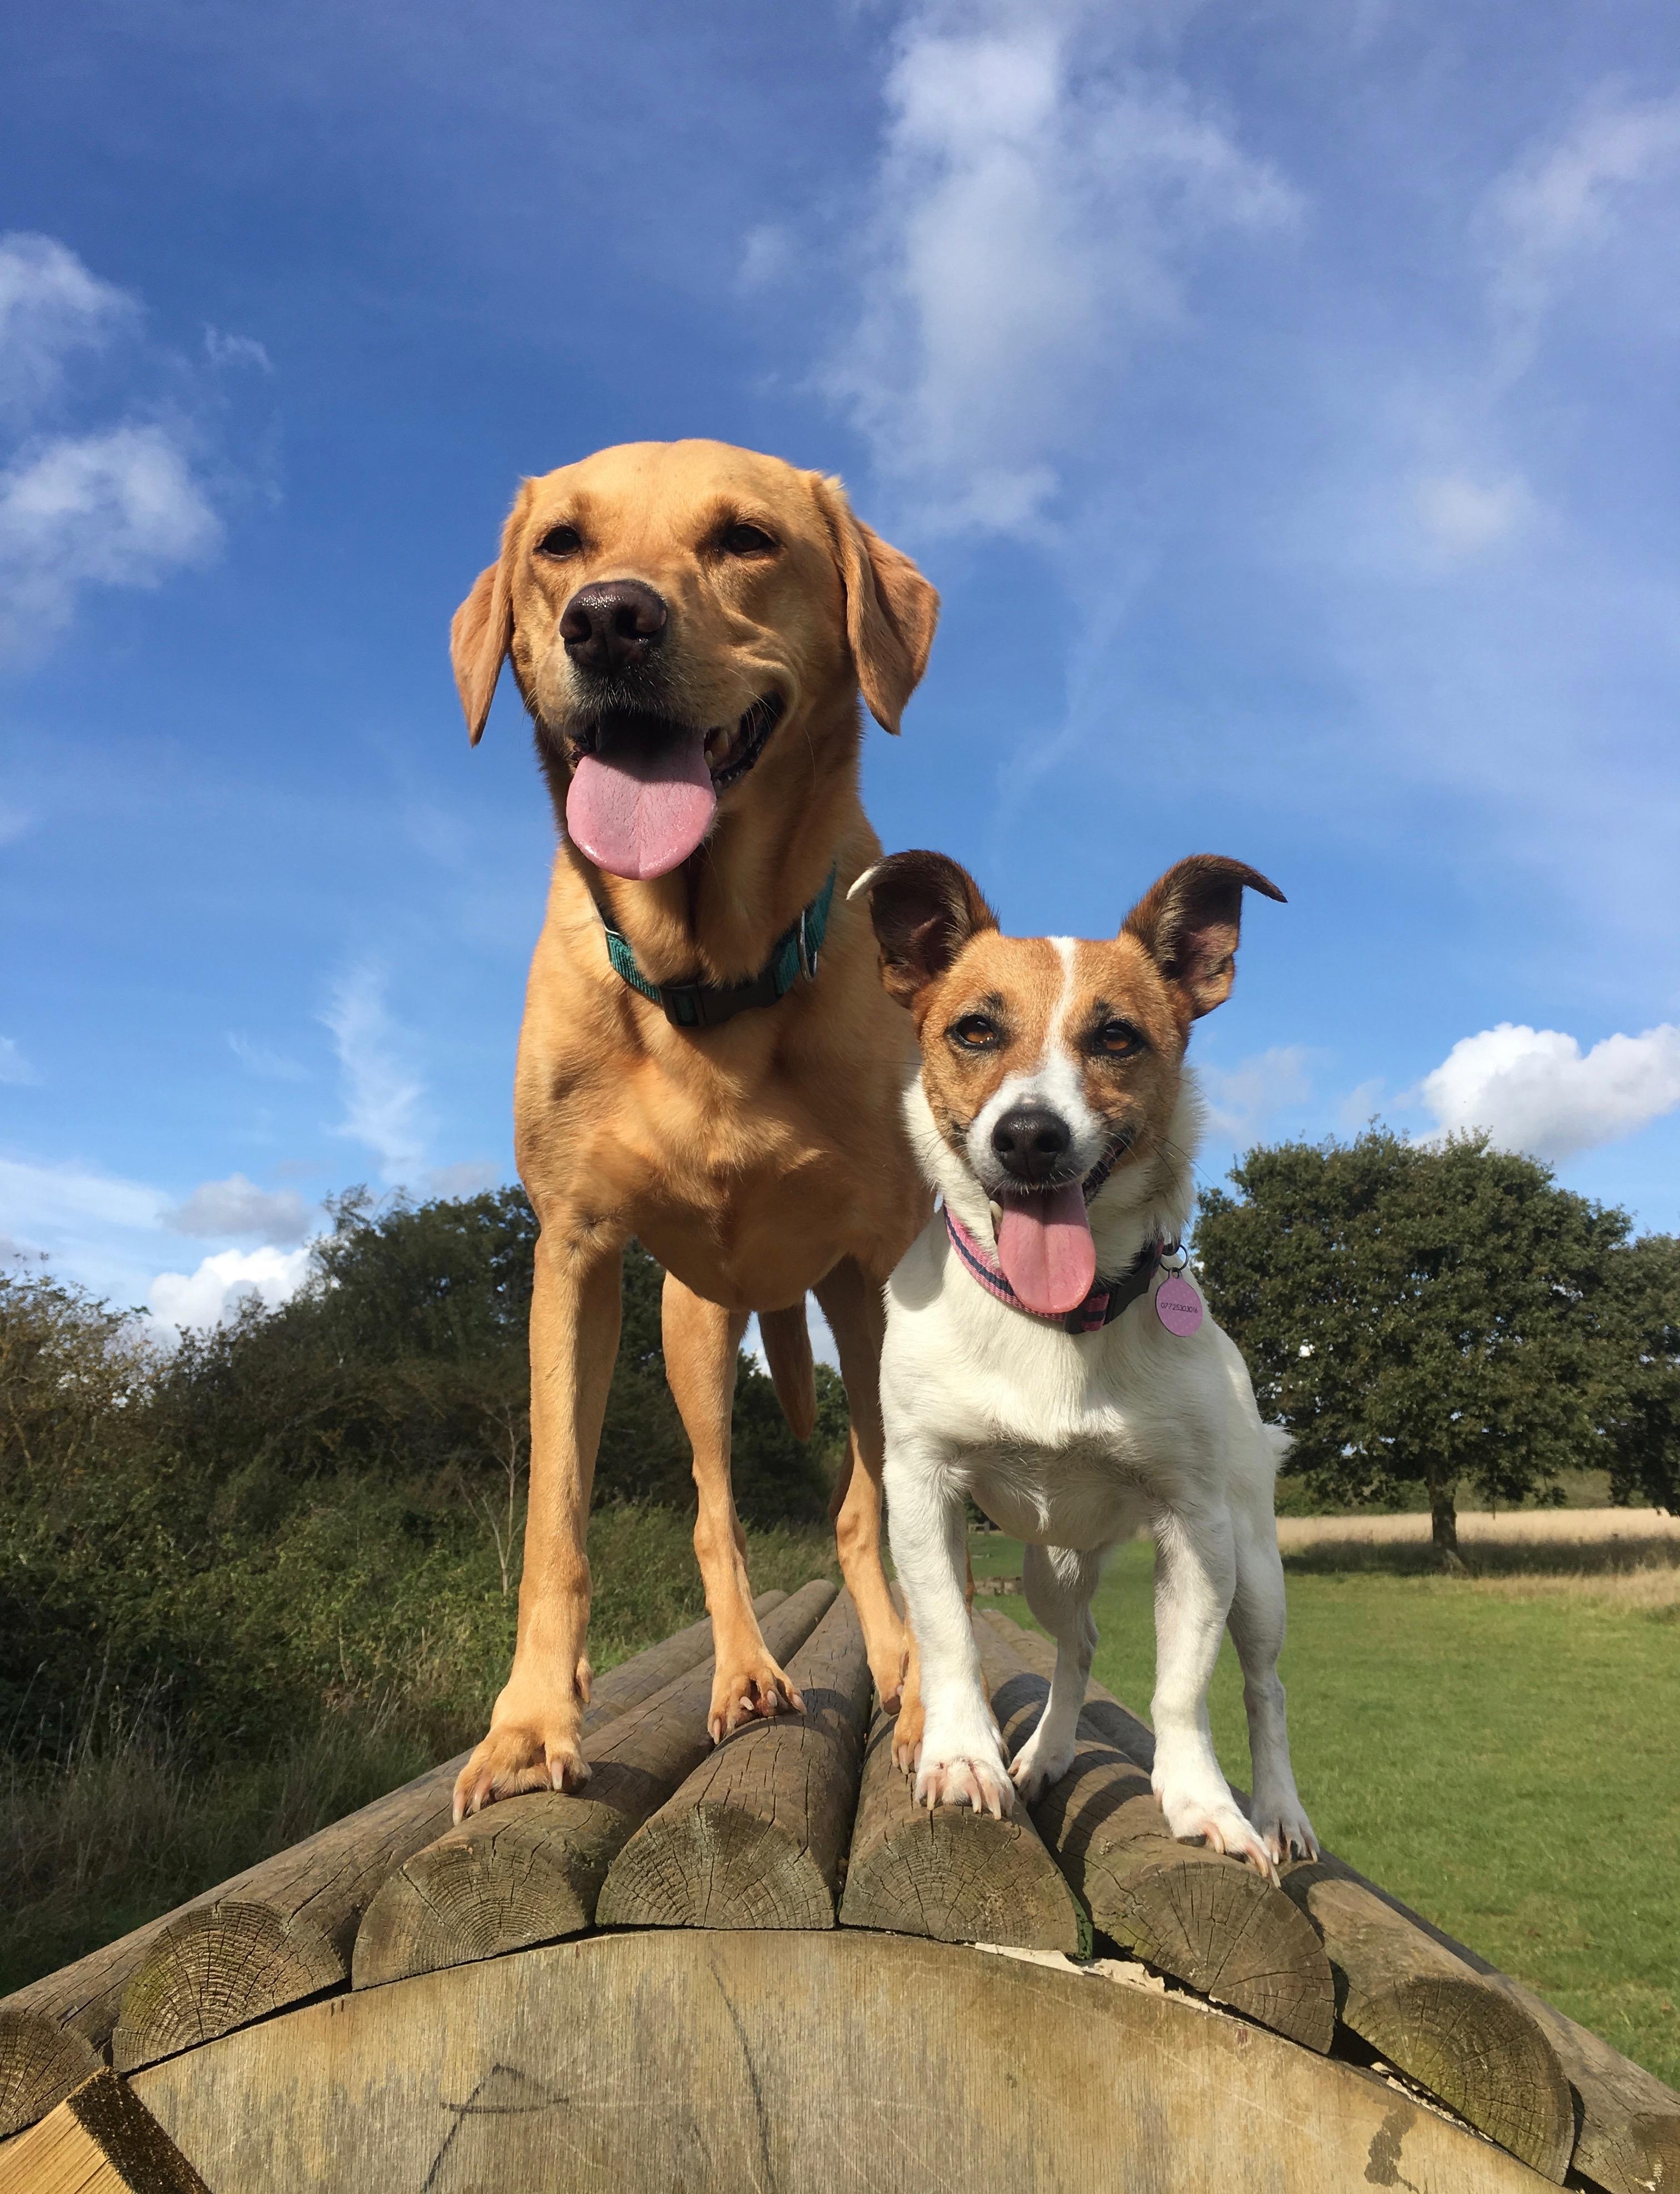 labrador and jet pose on jump